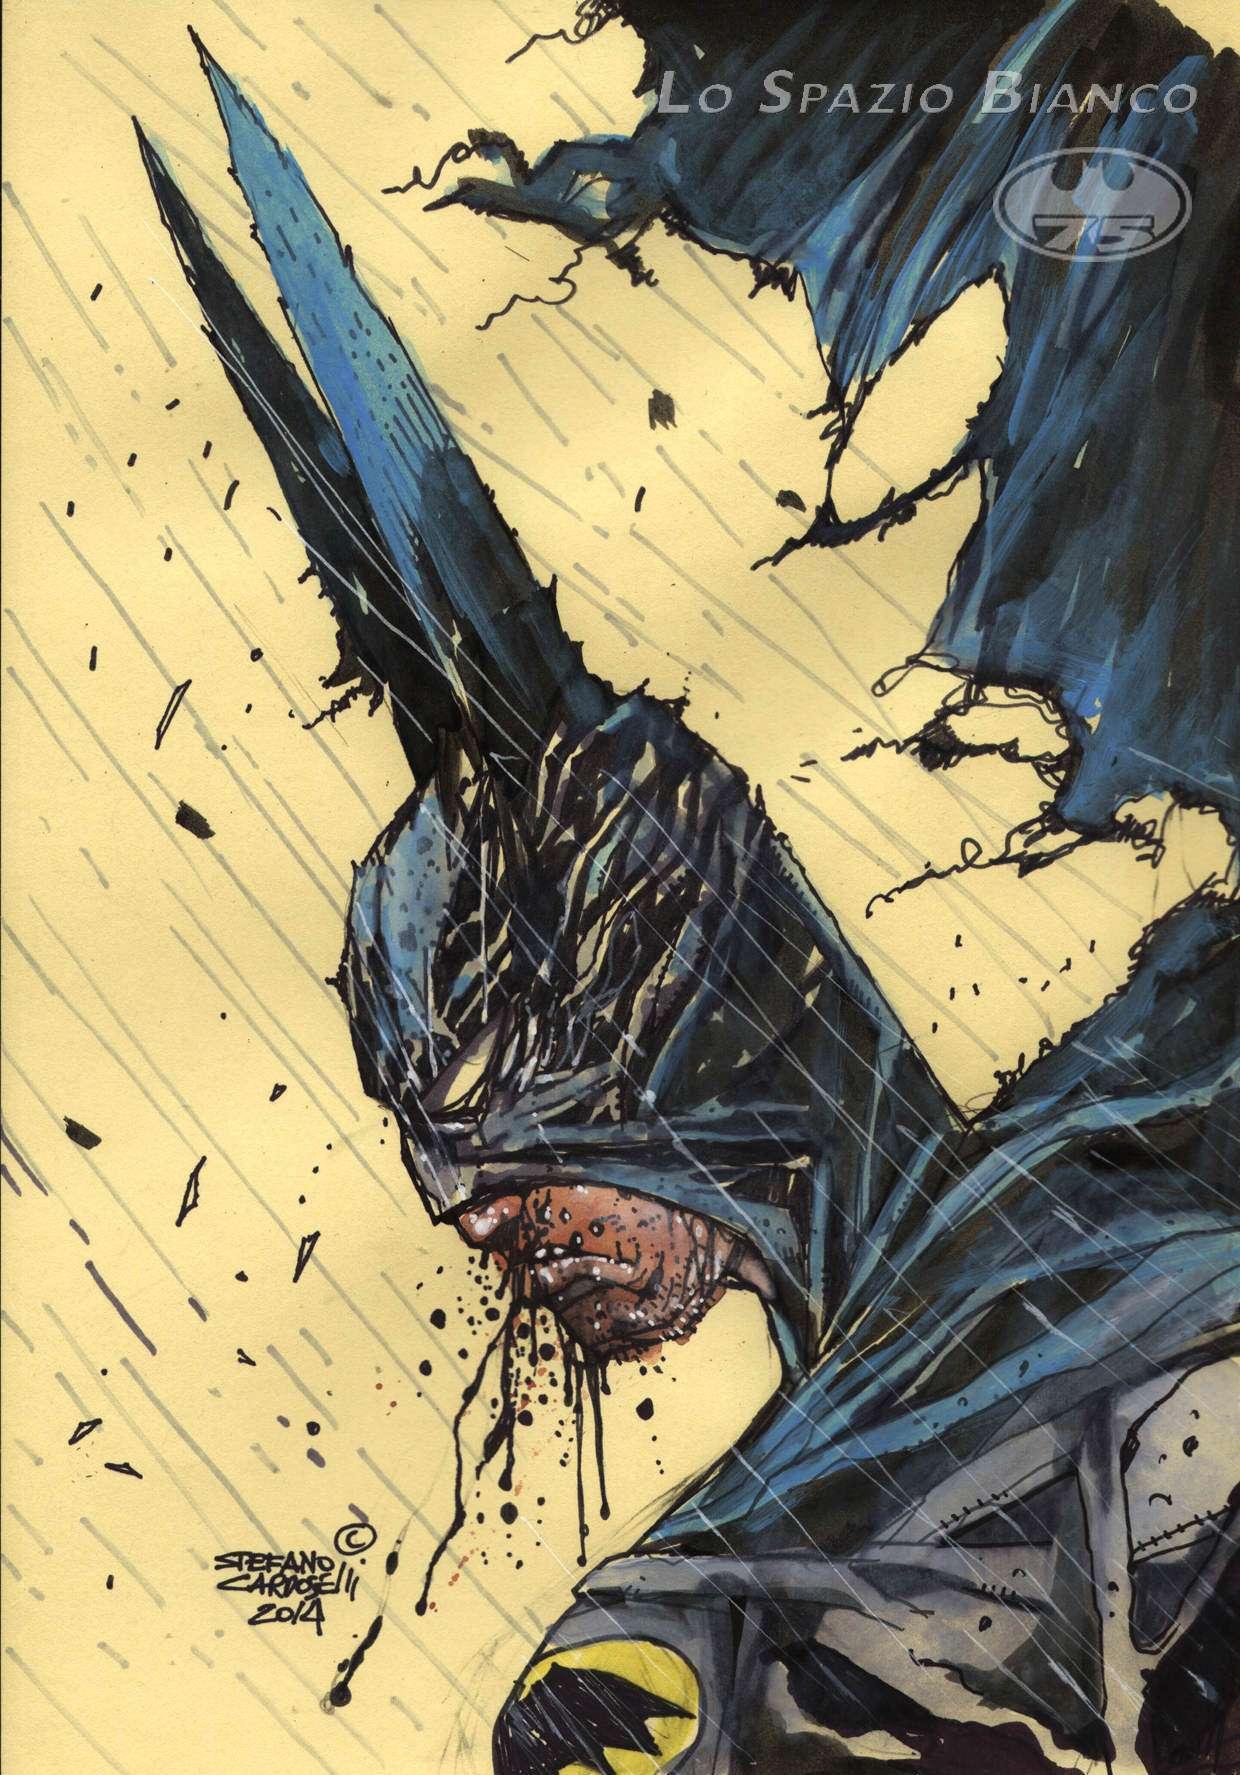 Batman-Stefano-Cardoselli_Omaggi